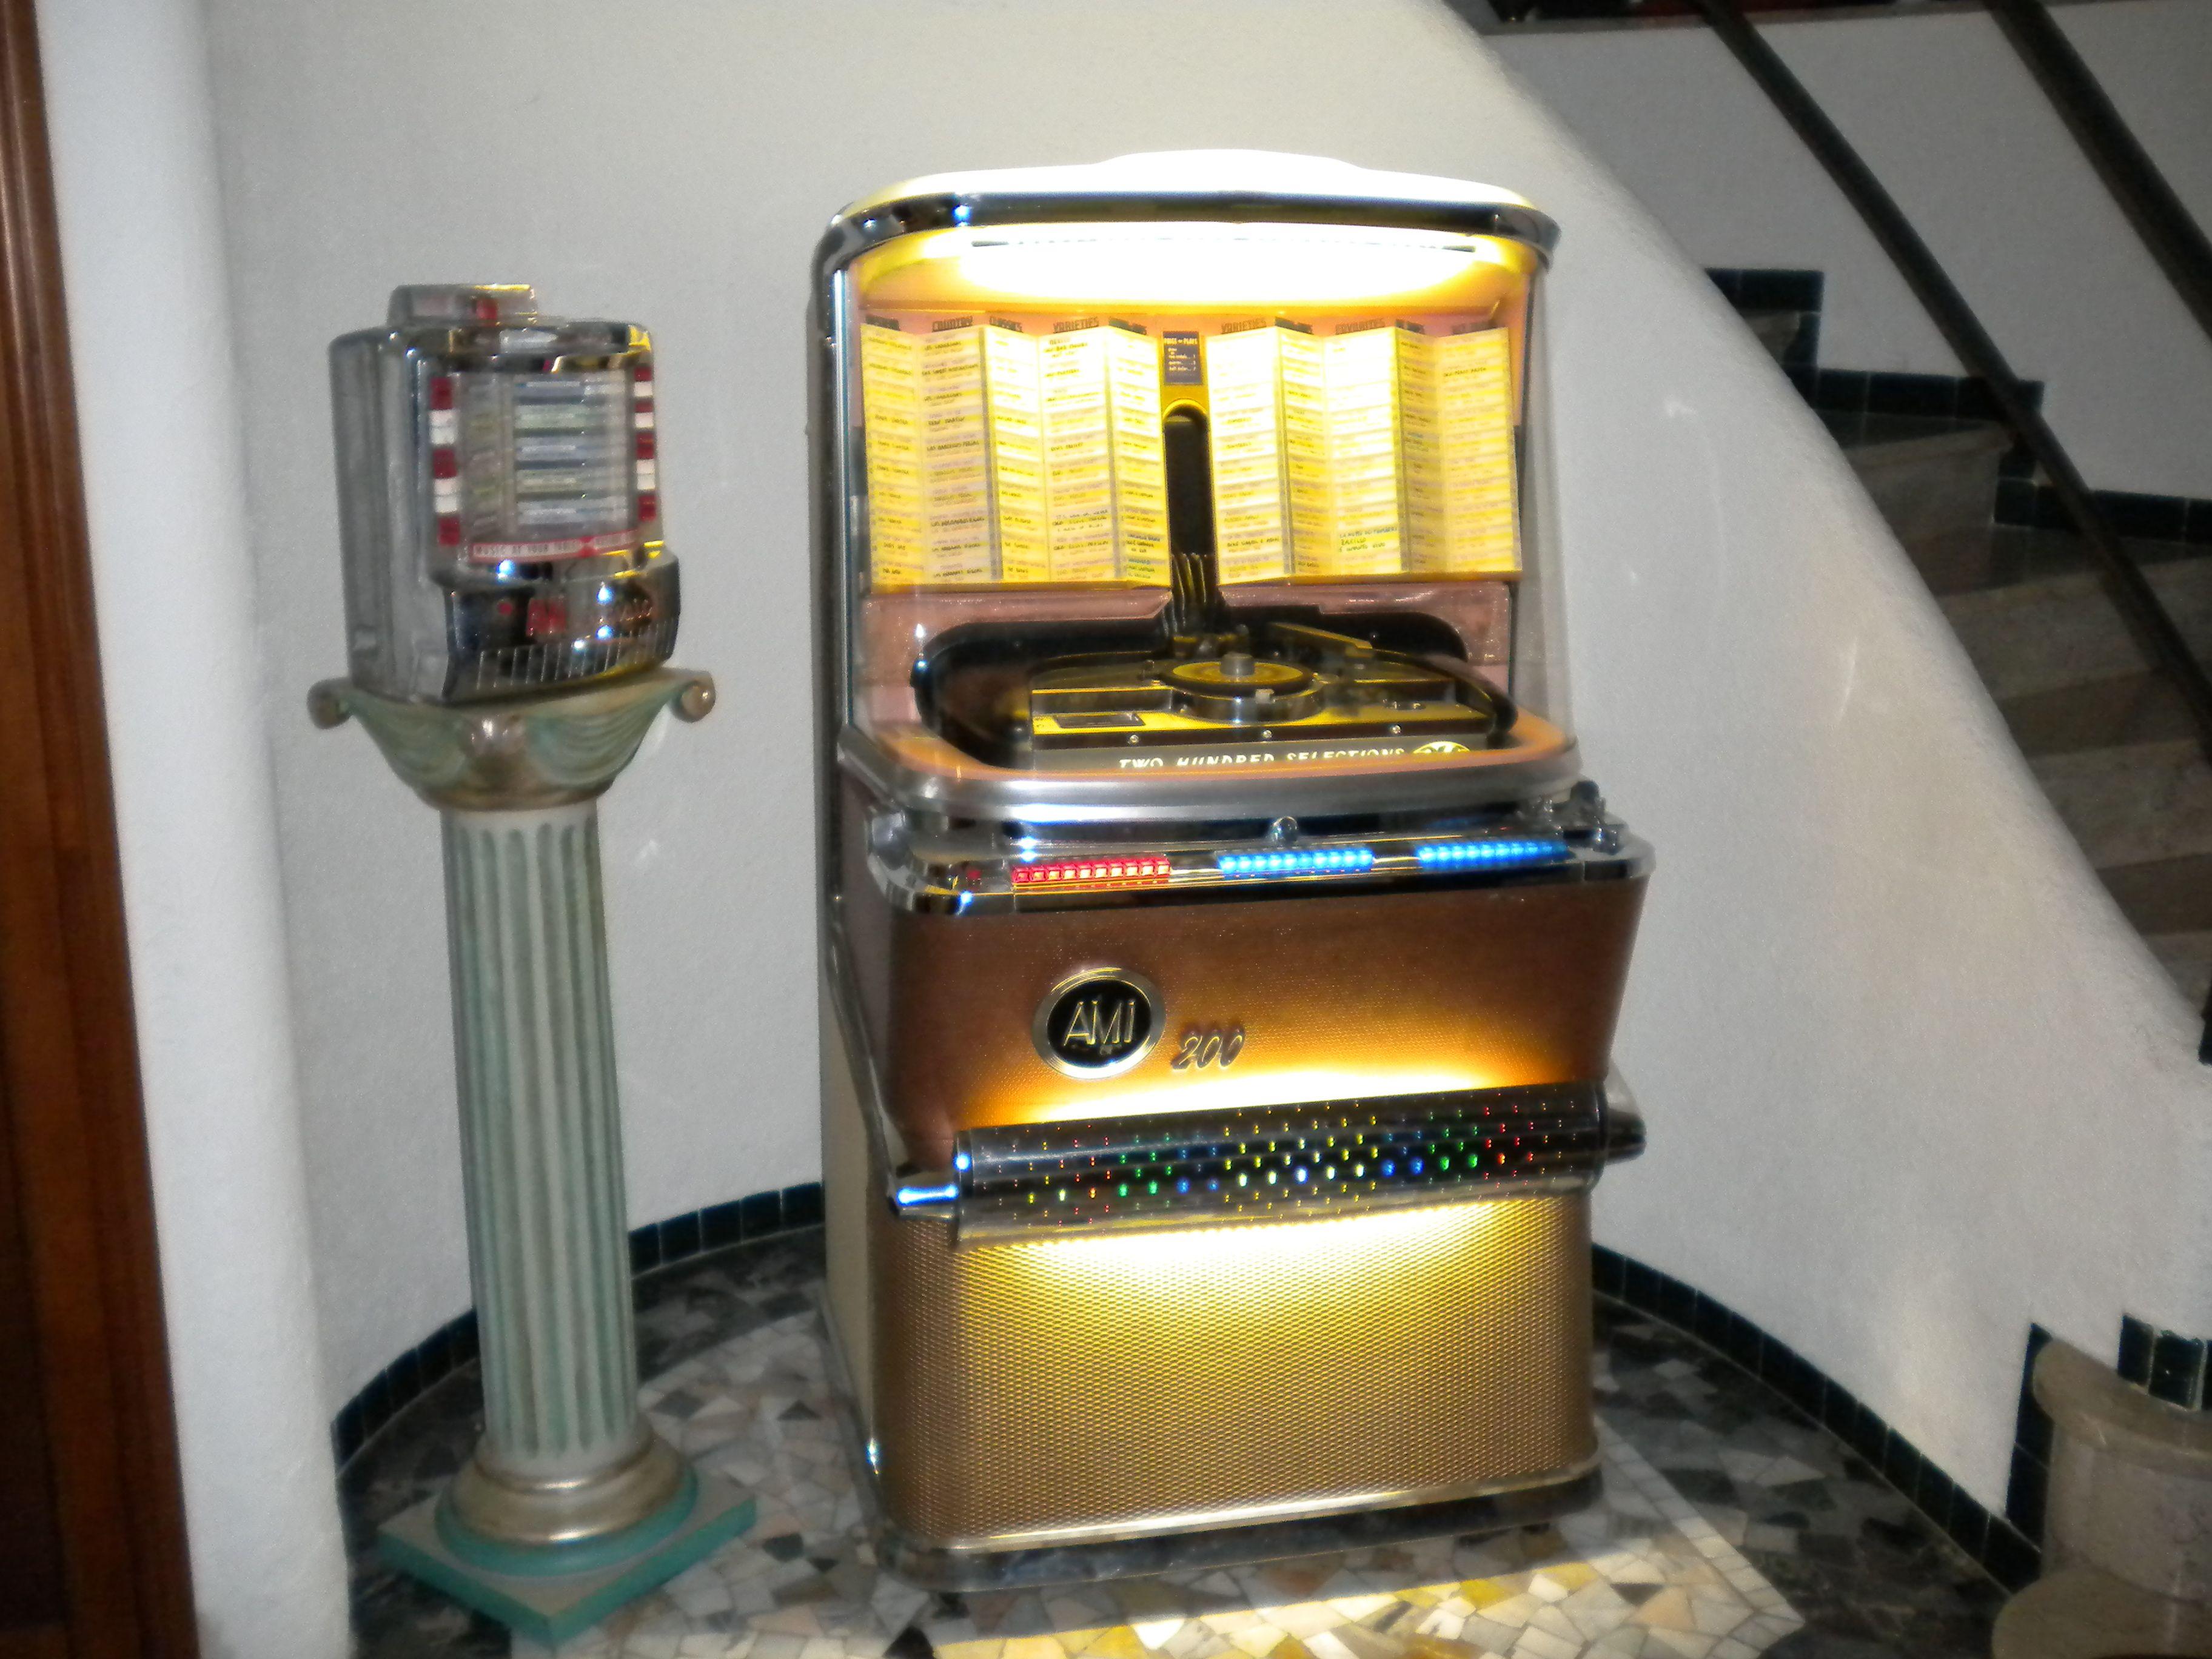 My Jukebox AMI H - Wallbox AMI WQ-200 | Jukeboxes